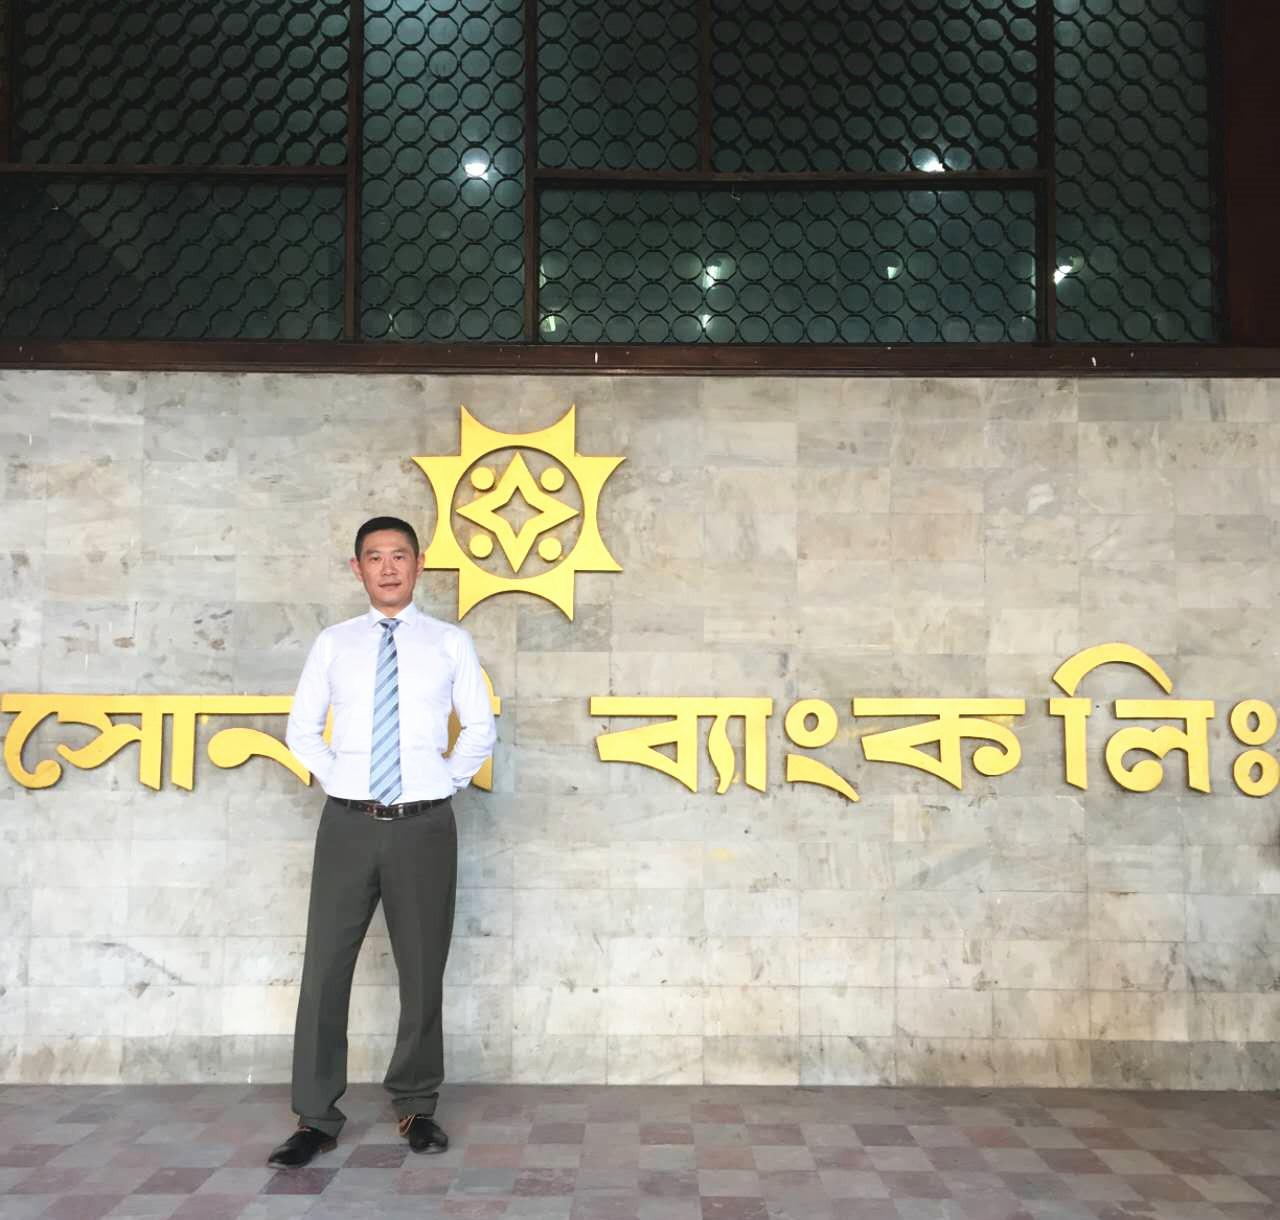 Ocean Shipping From Shanghai of China to Chittagong of Bangladesh